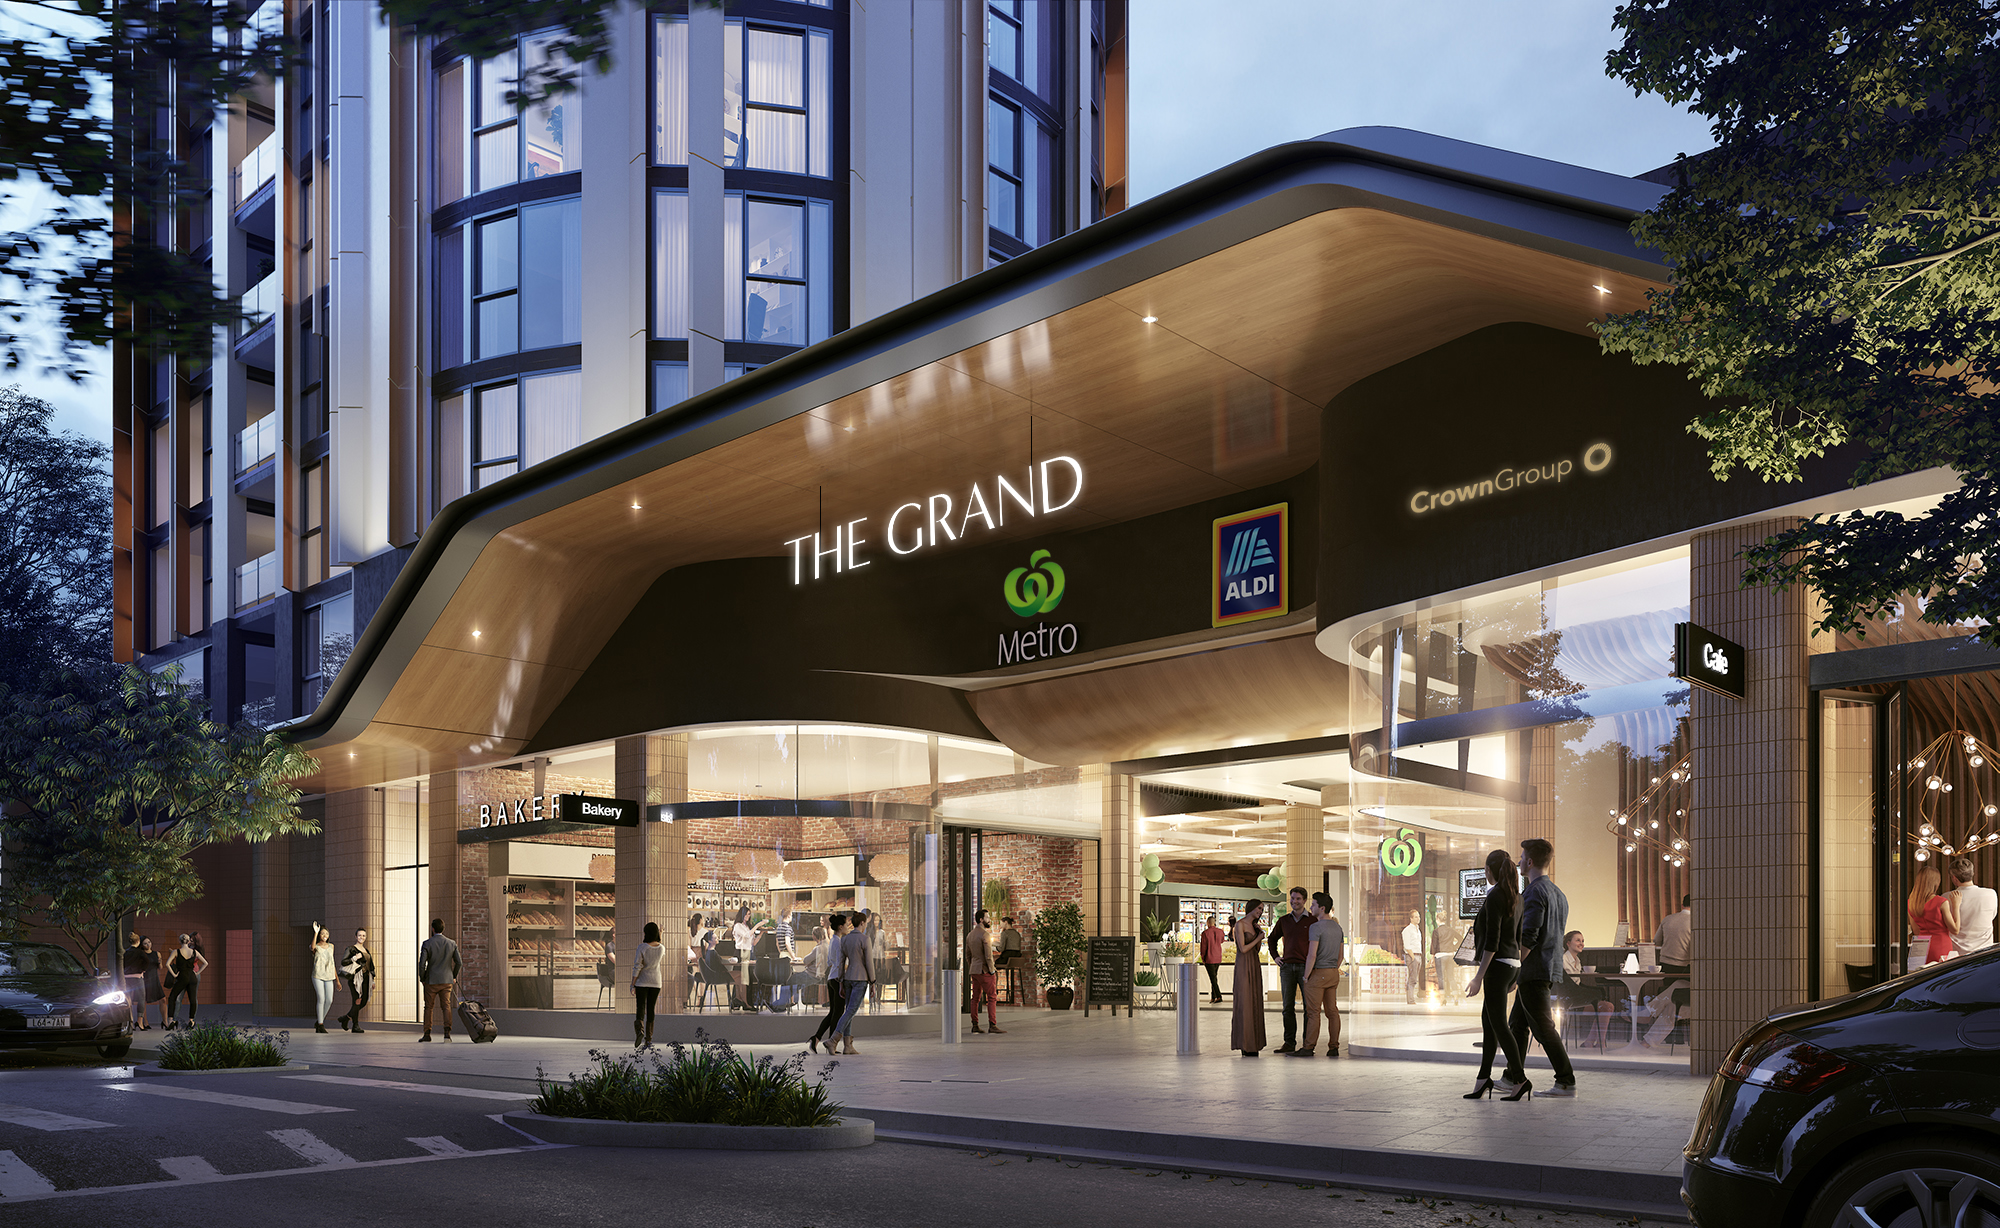 "Eastlakes emerging as Sydney's <span class=""pt_splitter pt_splitter-1"">latest urban growth area as Crown Group development progresses</span>"